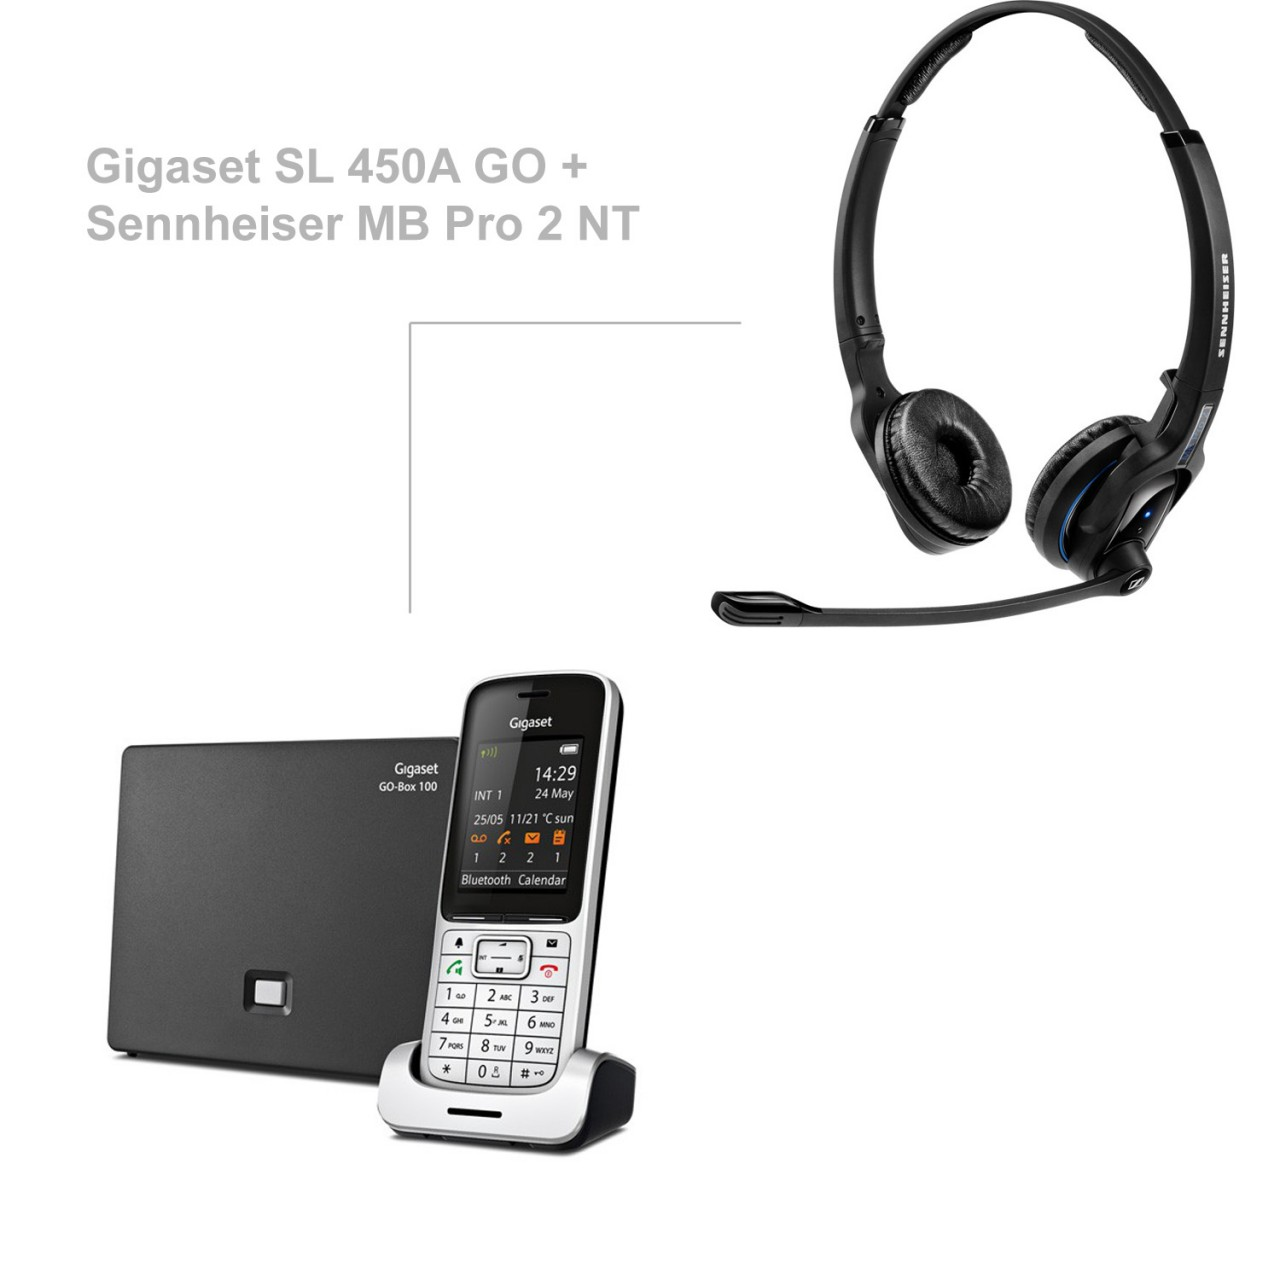 Fonkelnieuw Gigaset SL 450A GO + Sennheiser MB Pro 2 NT TR-59